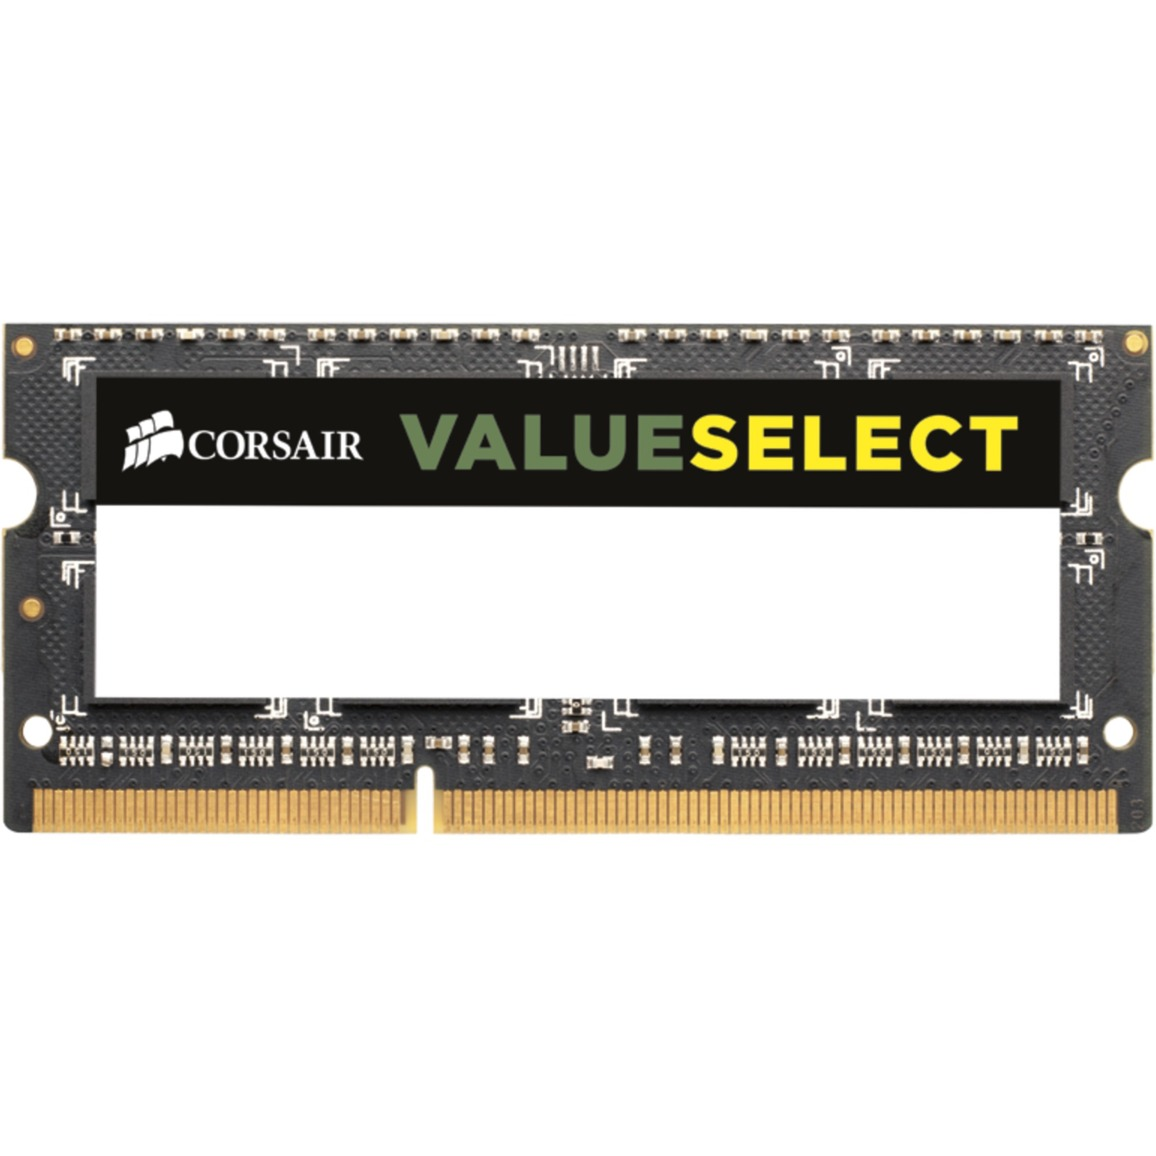 4GB 1600MHz DDR3 SODIMM módulo de memoria, Memoria RAM